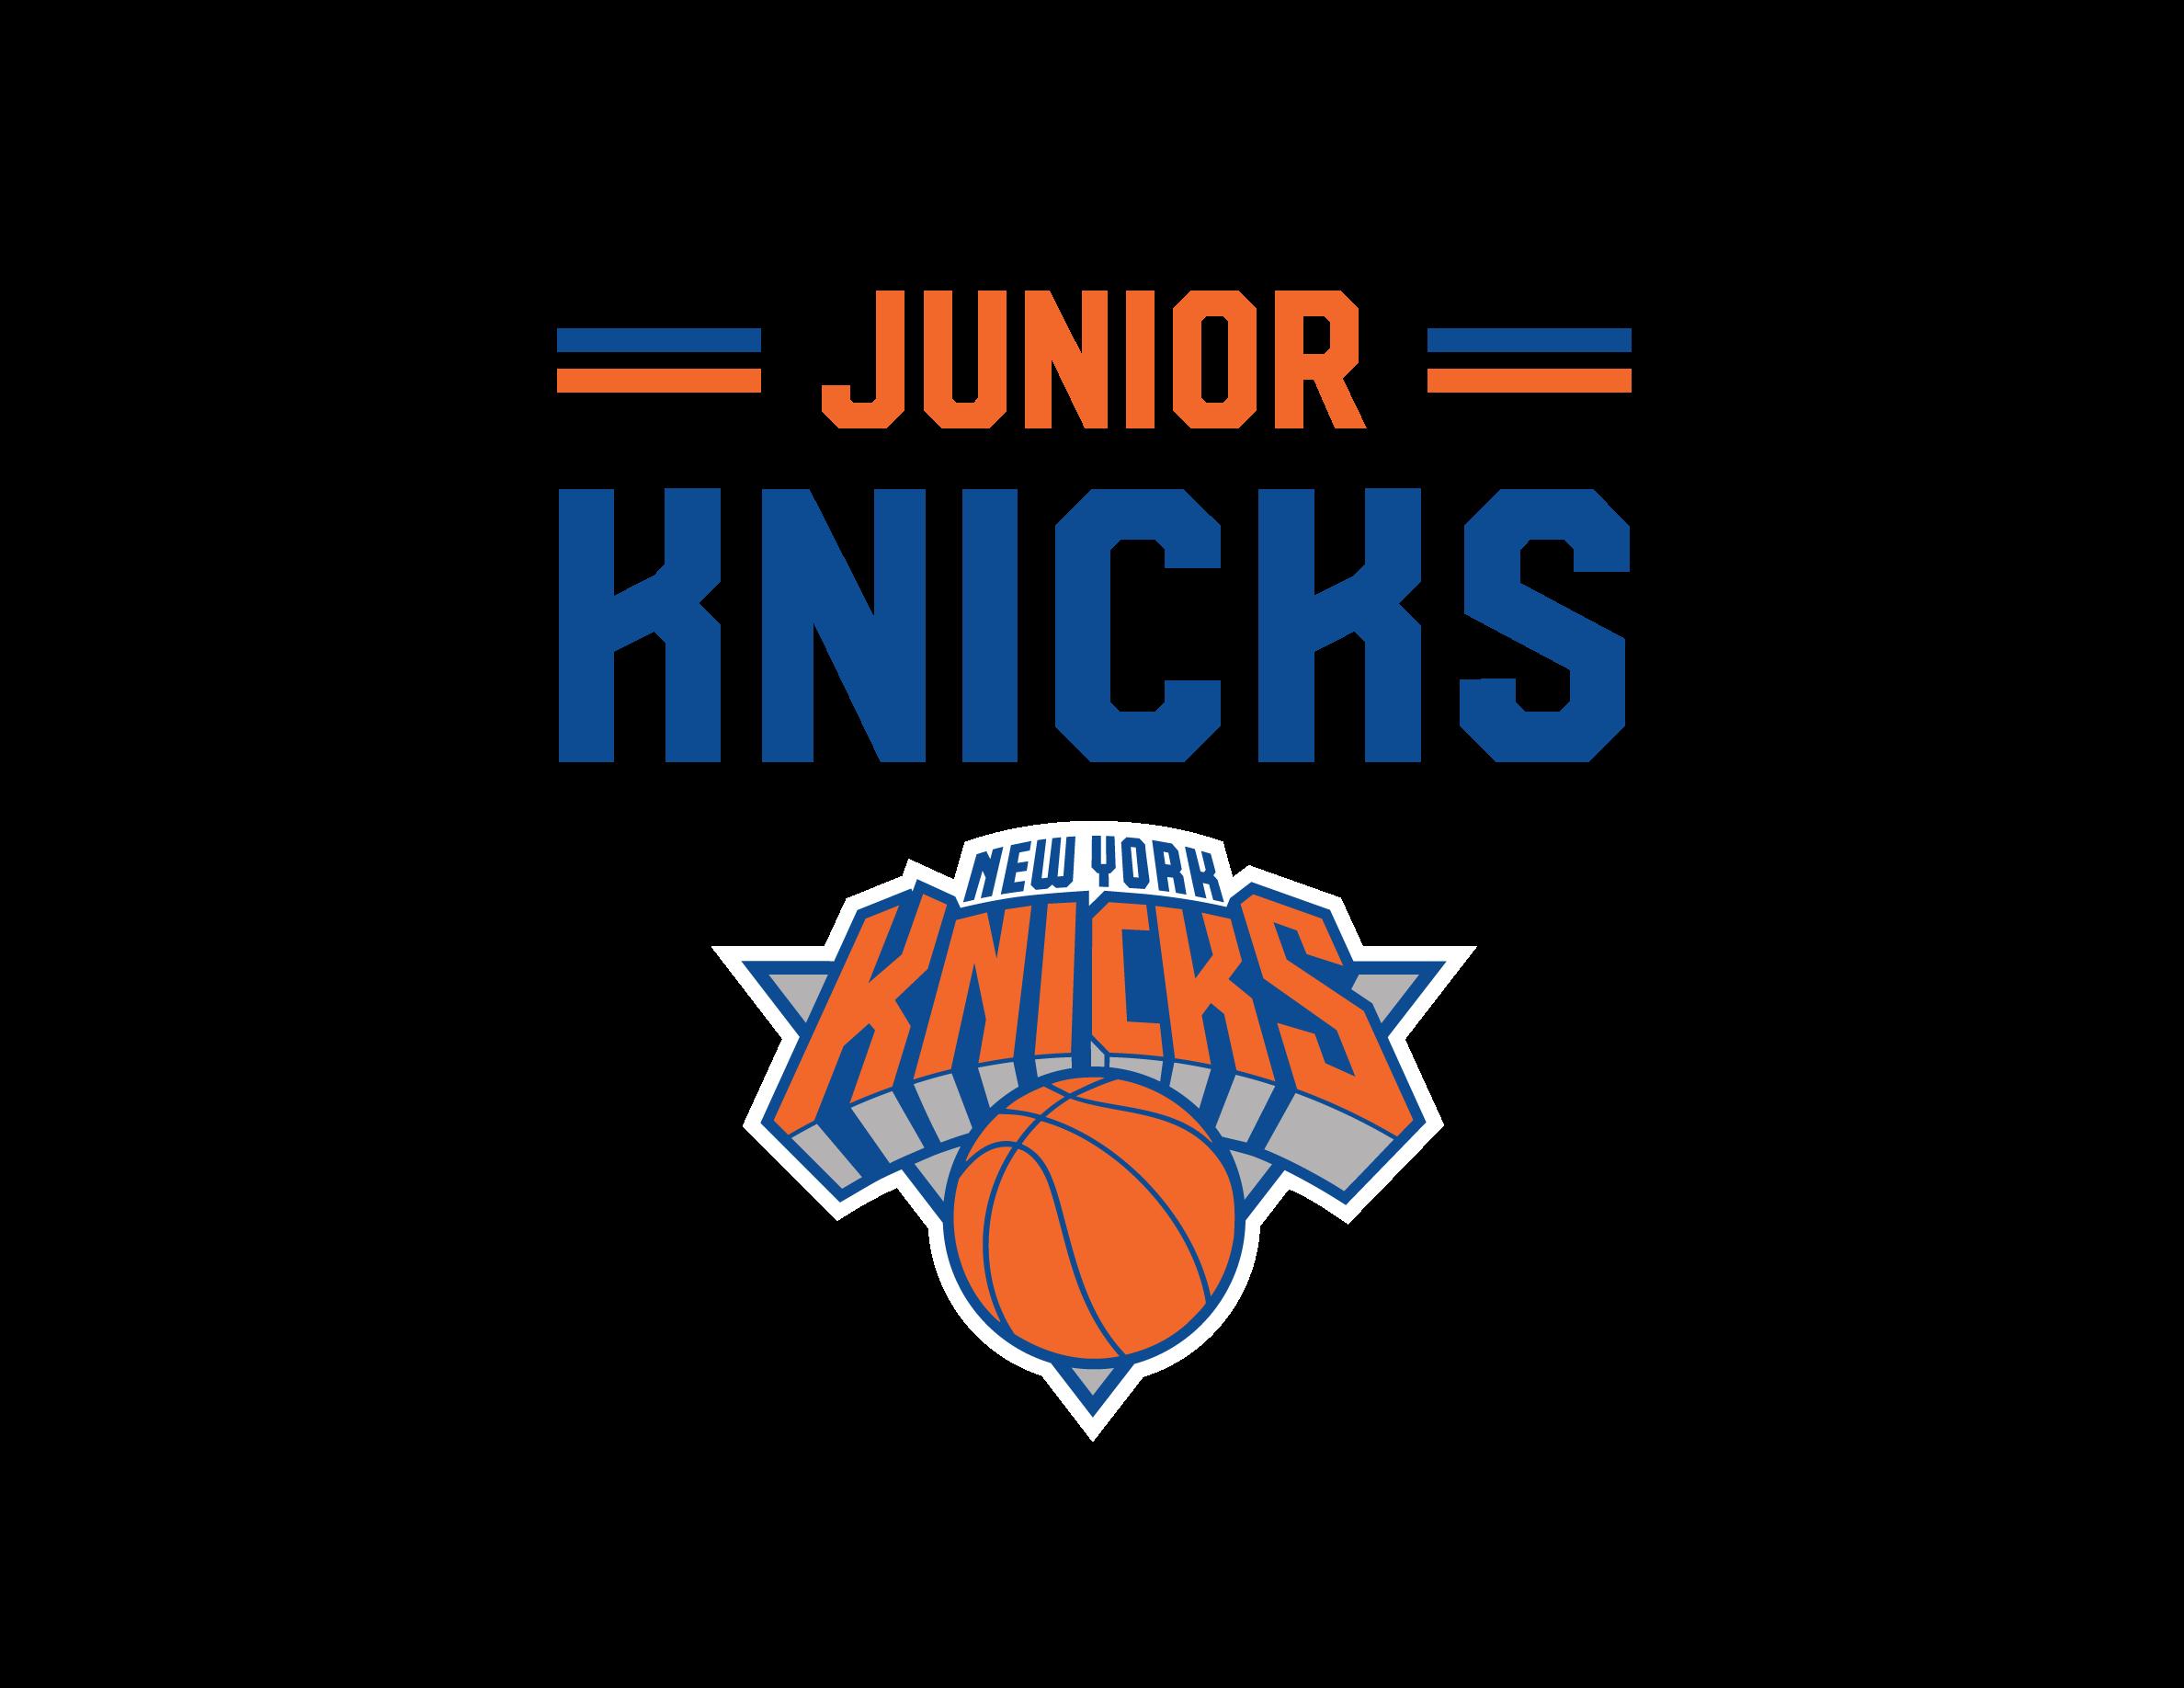 madison square garden westchester knicks events rh westchesterknicks leagueapps com new york knicks logo font